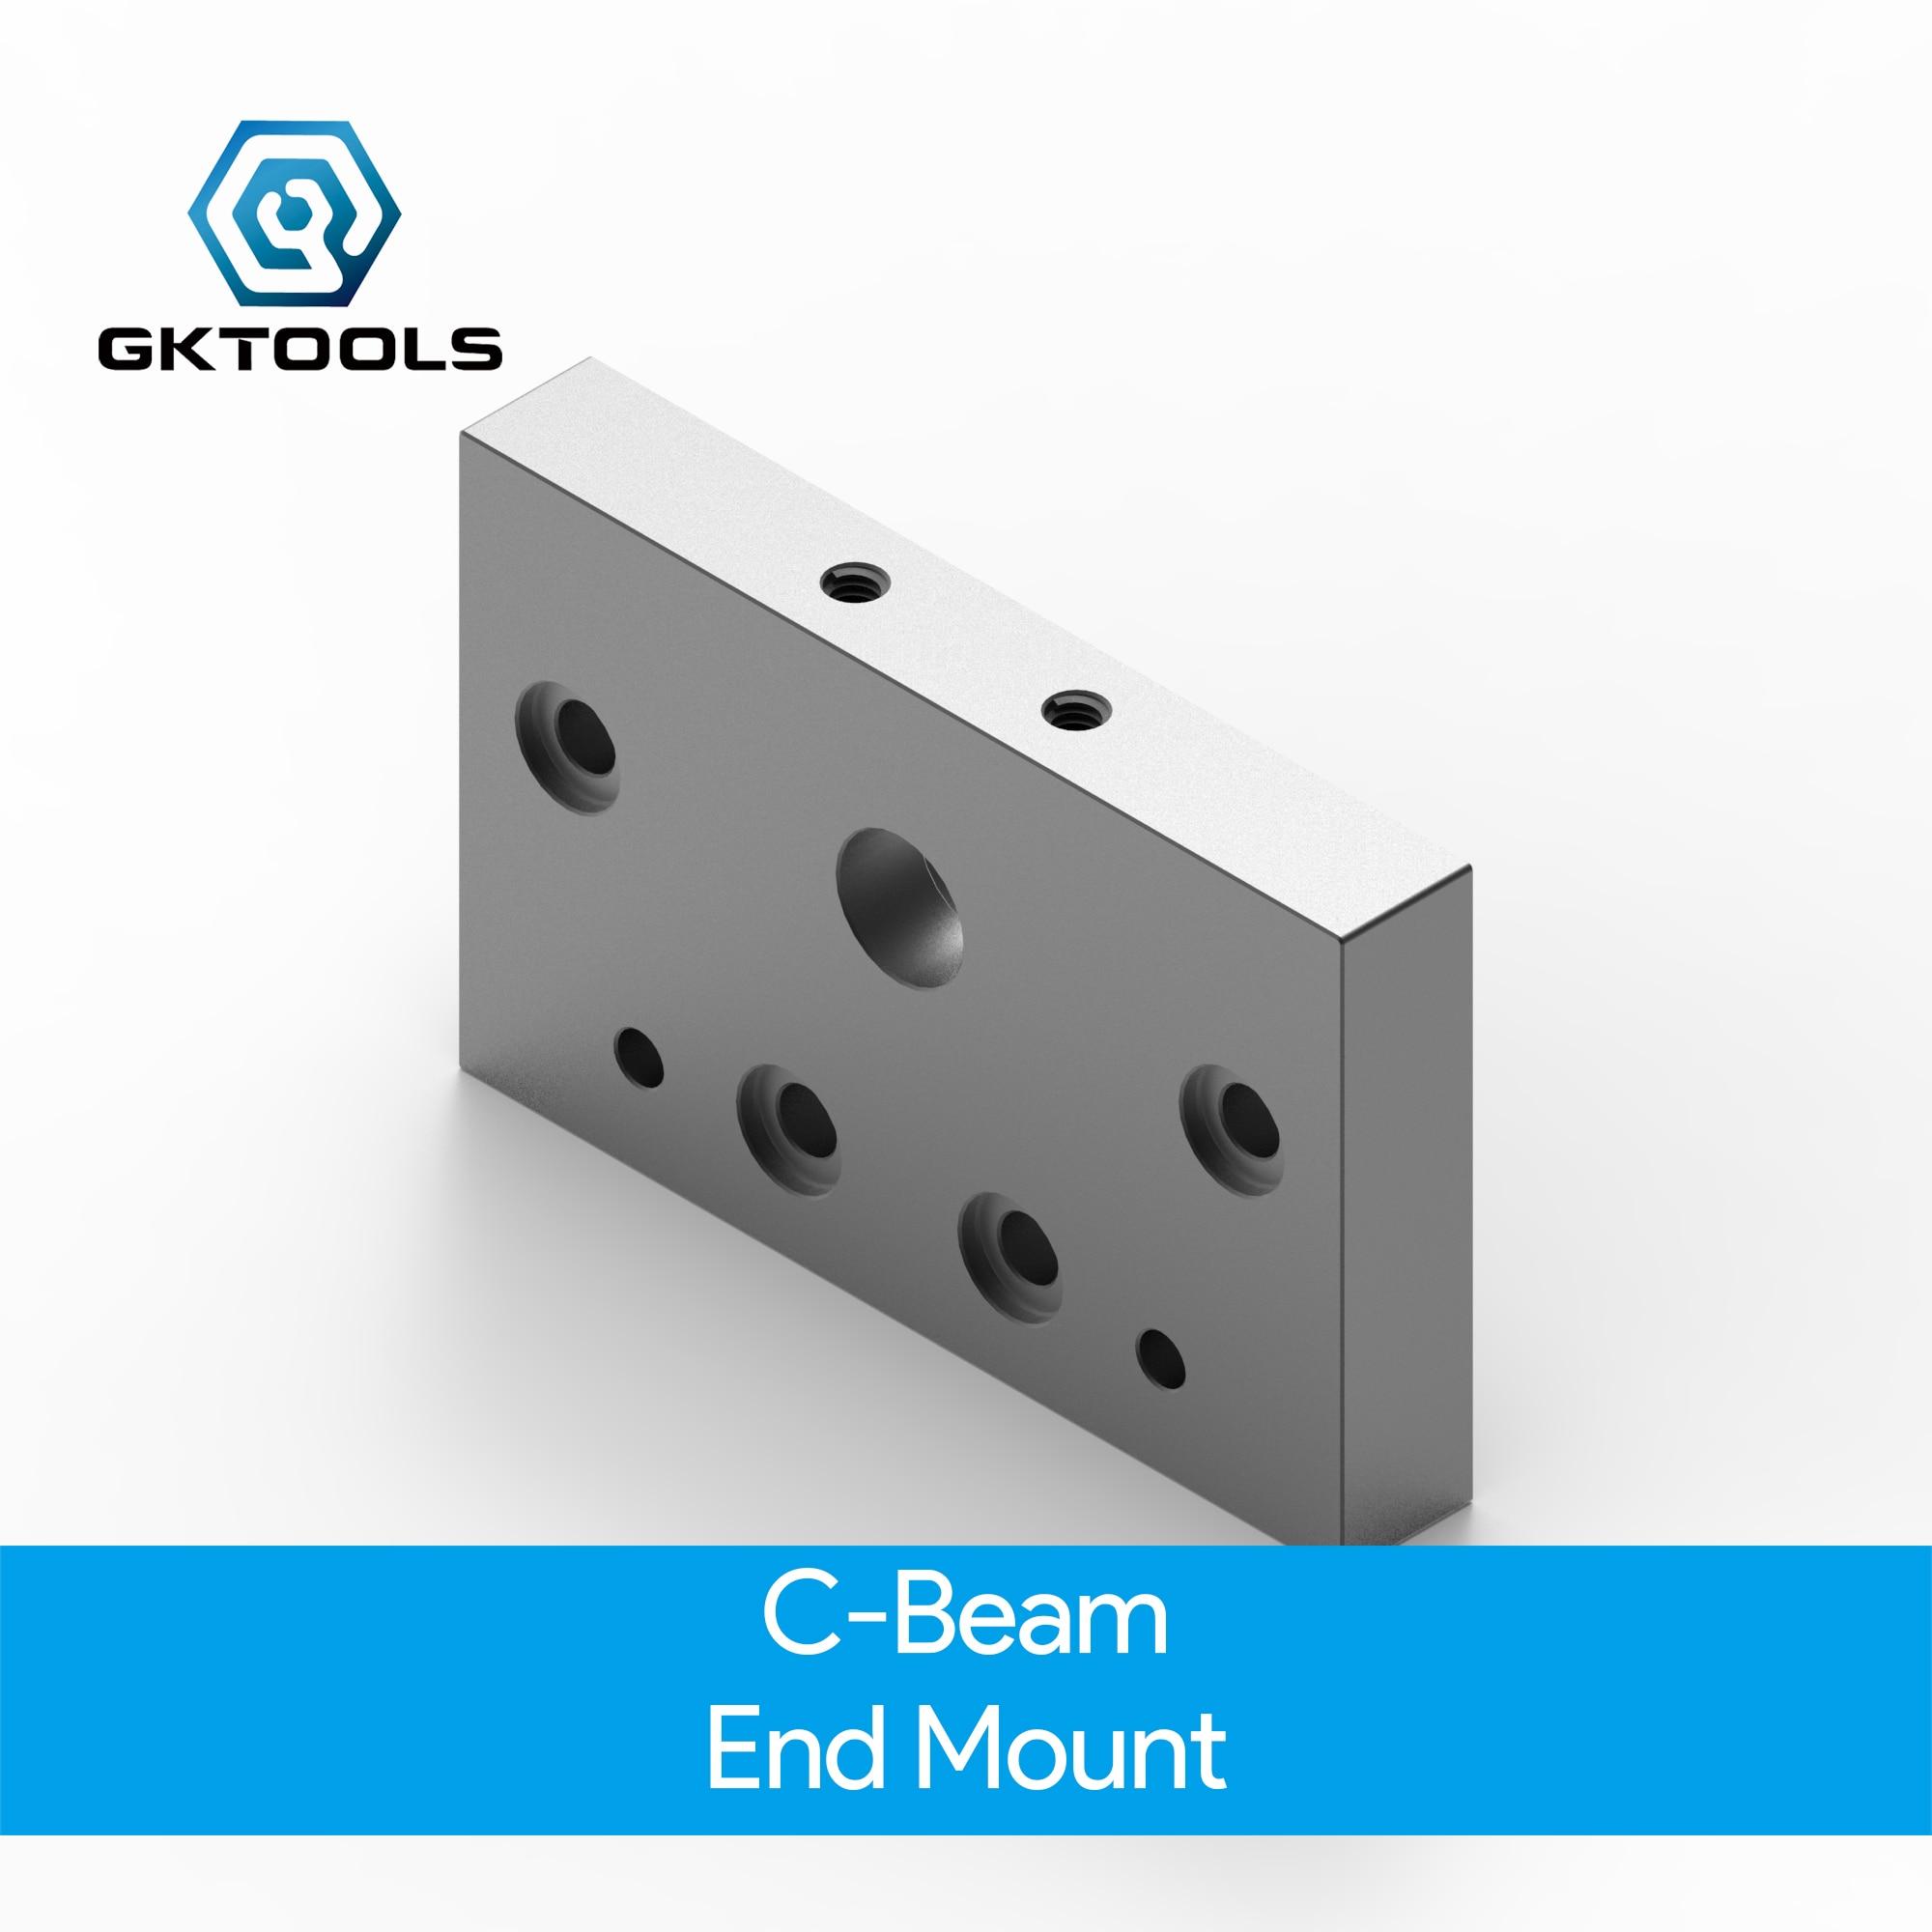 OpenBuilds C-Beam® End Mount